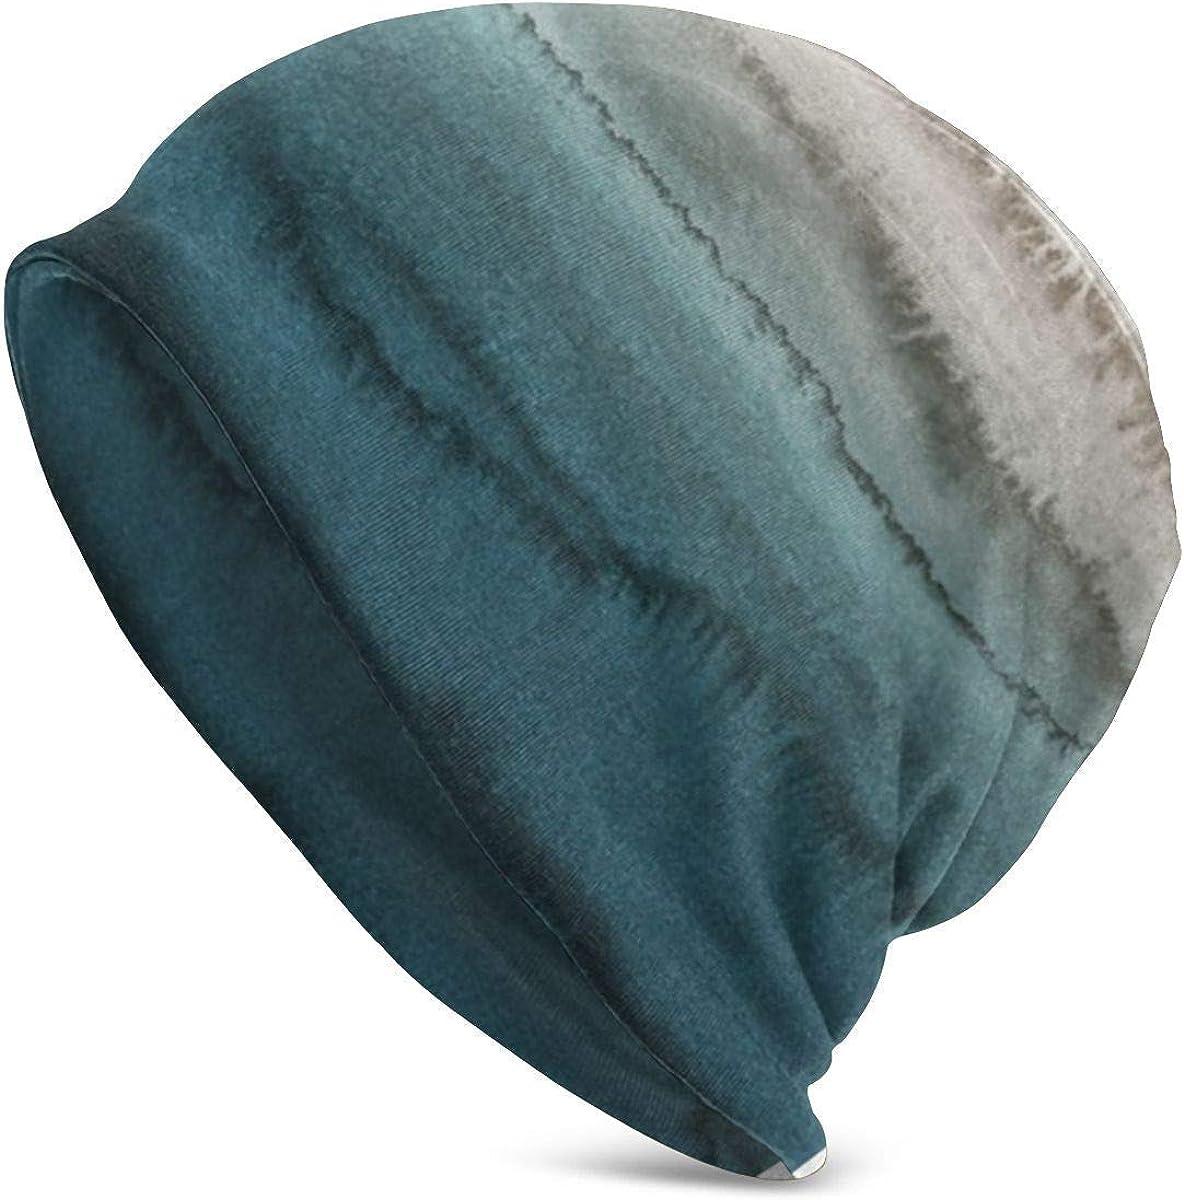 Dentro de Las Mareas Crashing Waves Prints Unisex Adult Knit Hat Beanie Hat Casual Unisex Fashion Warm Hat Negro